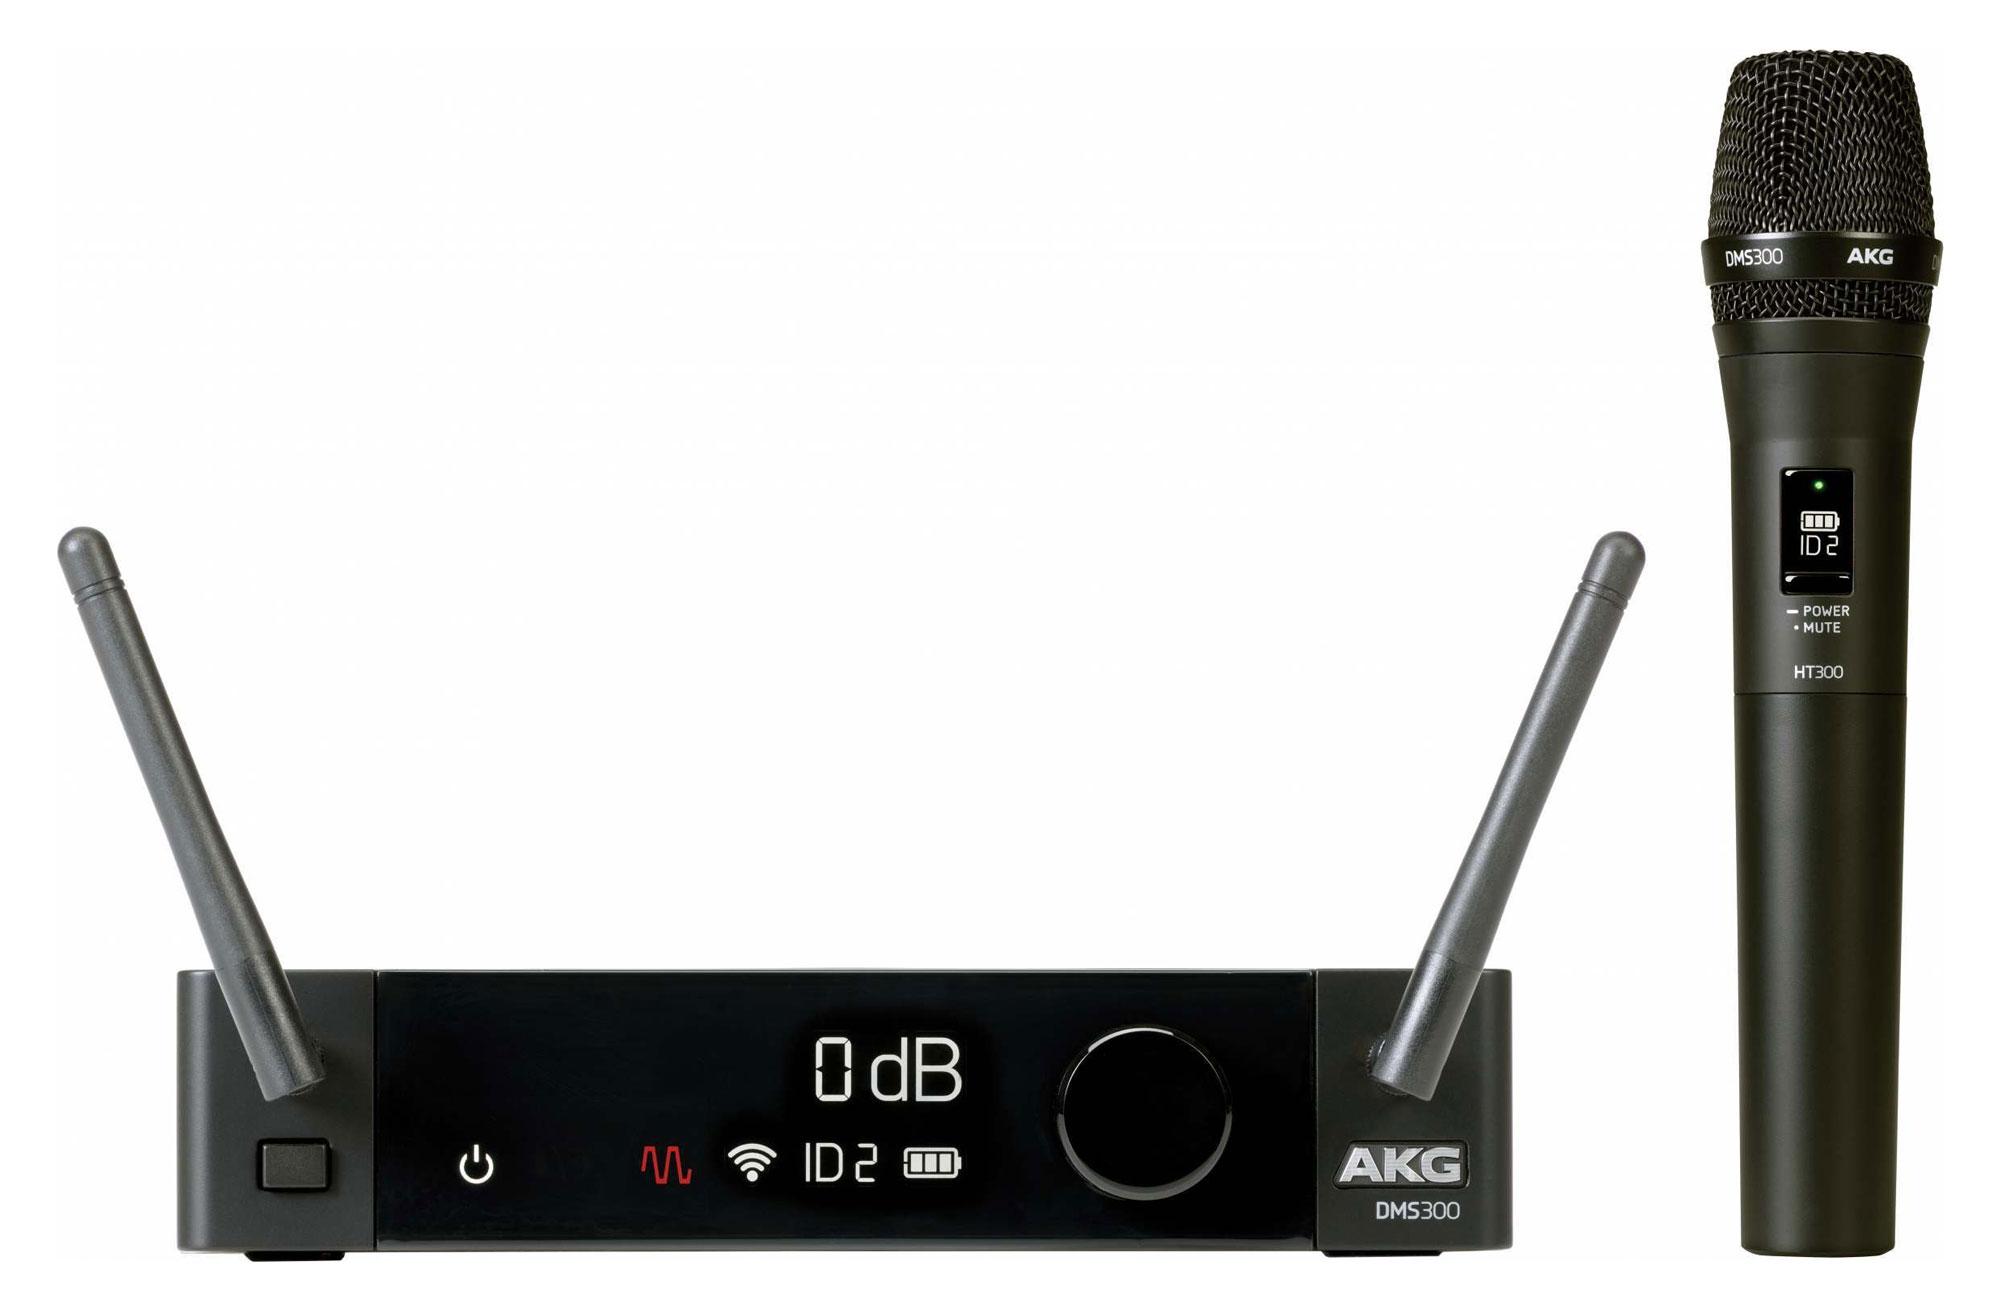 Mikrofone - AKG DMS300 Vocal Set P5 Retoure (Zustand sehr gut) - Onlineshop Musikhaus Kirstein